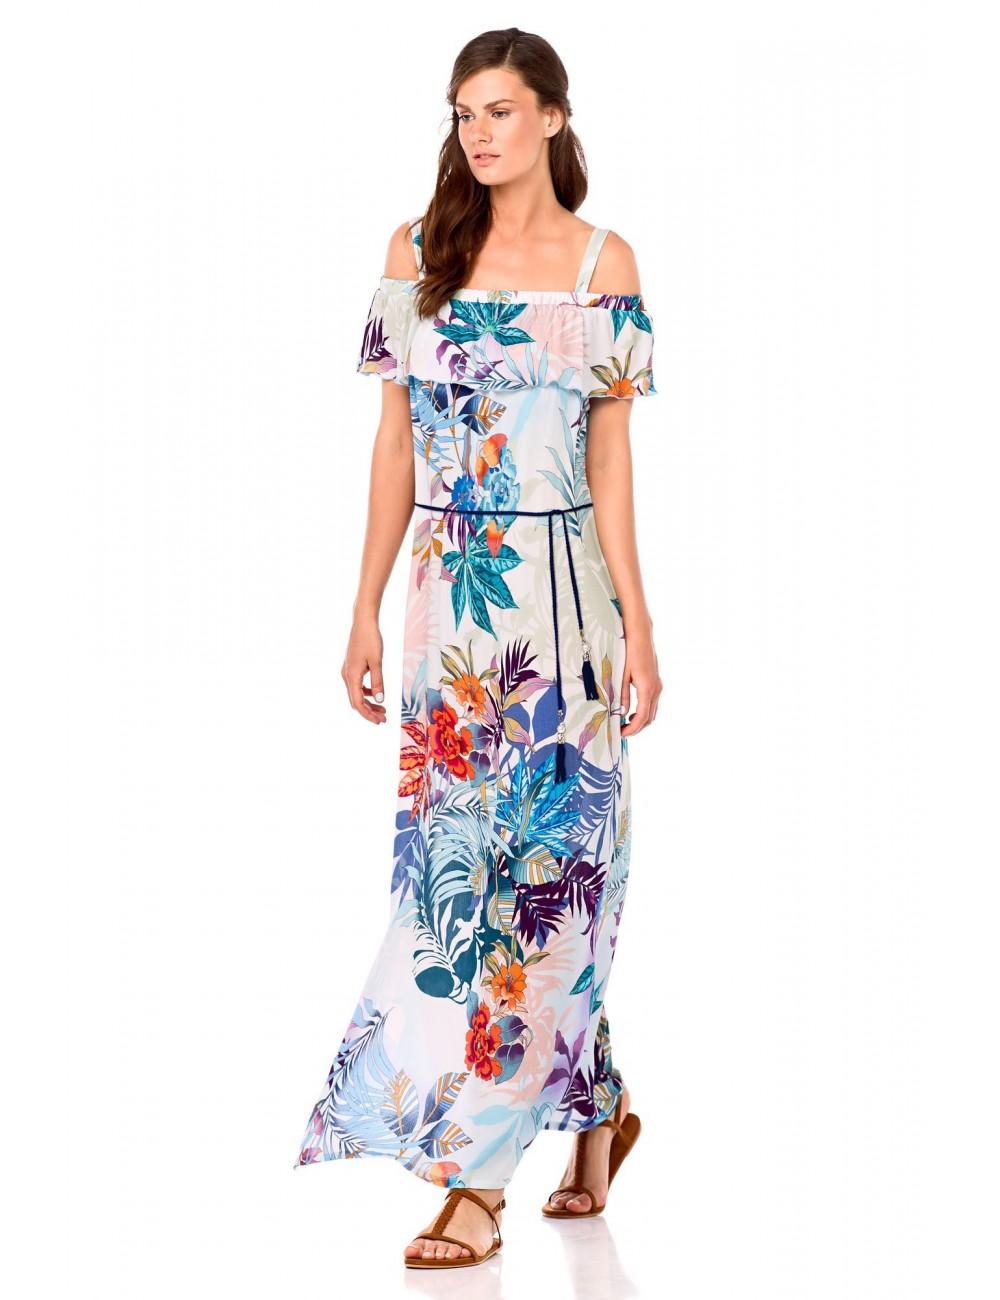 f7b582a44db1 Γυναικείο καλοκαιρινό φόρεμα maxi Vamp 6949